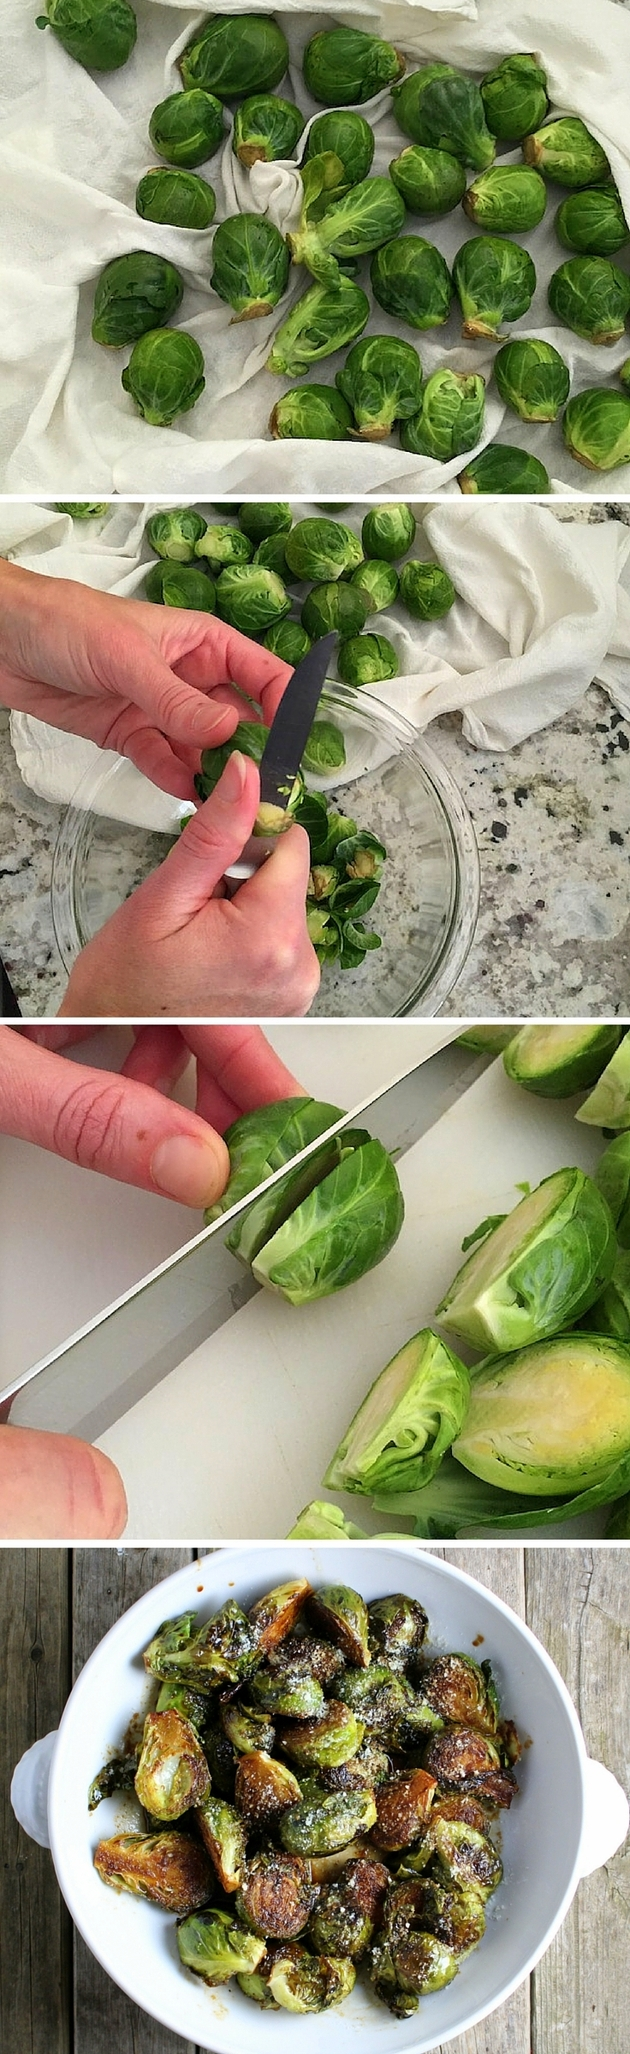 Balsamic Glazed Brussels Sprouts via @h_tasteandsee